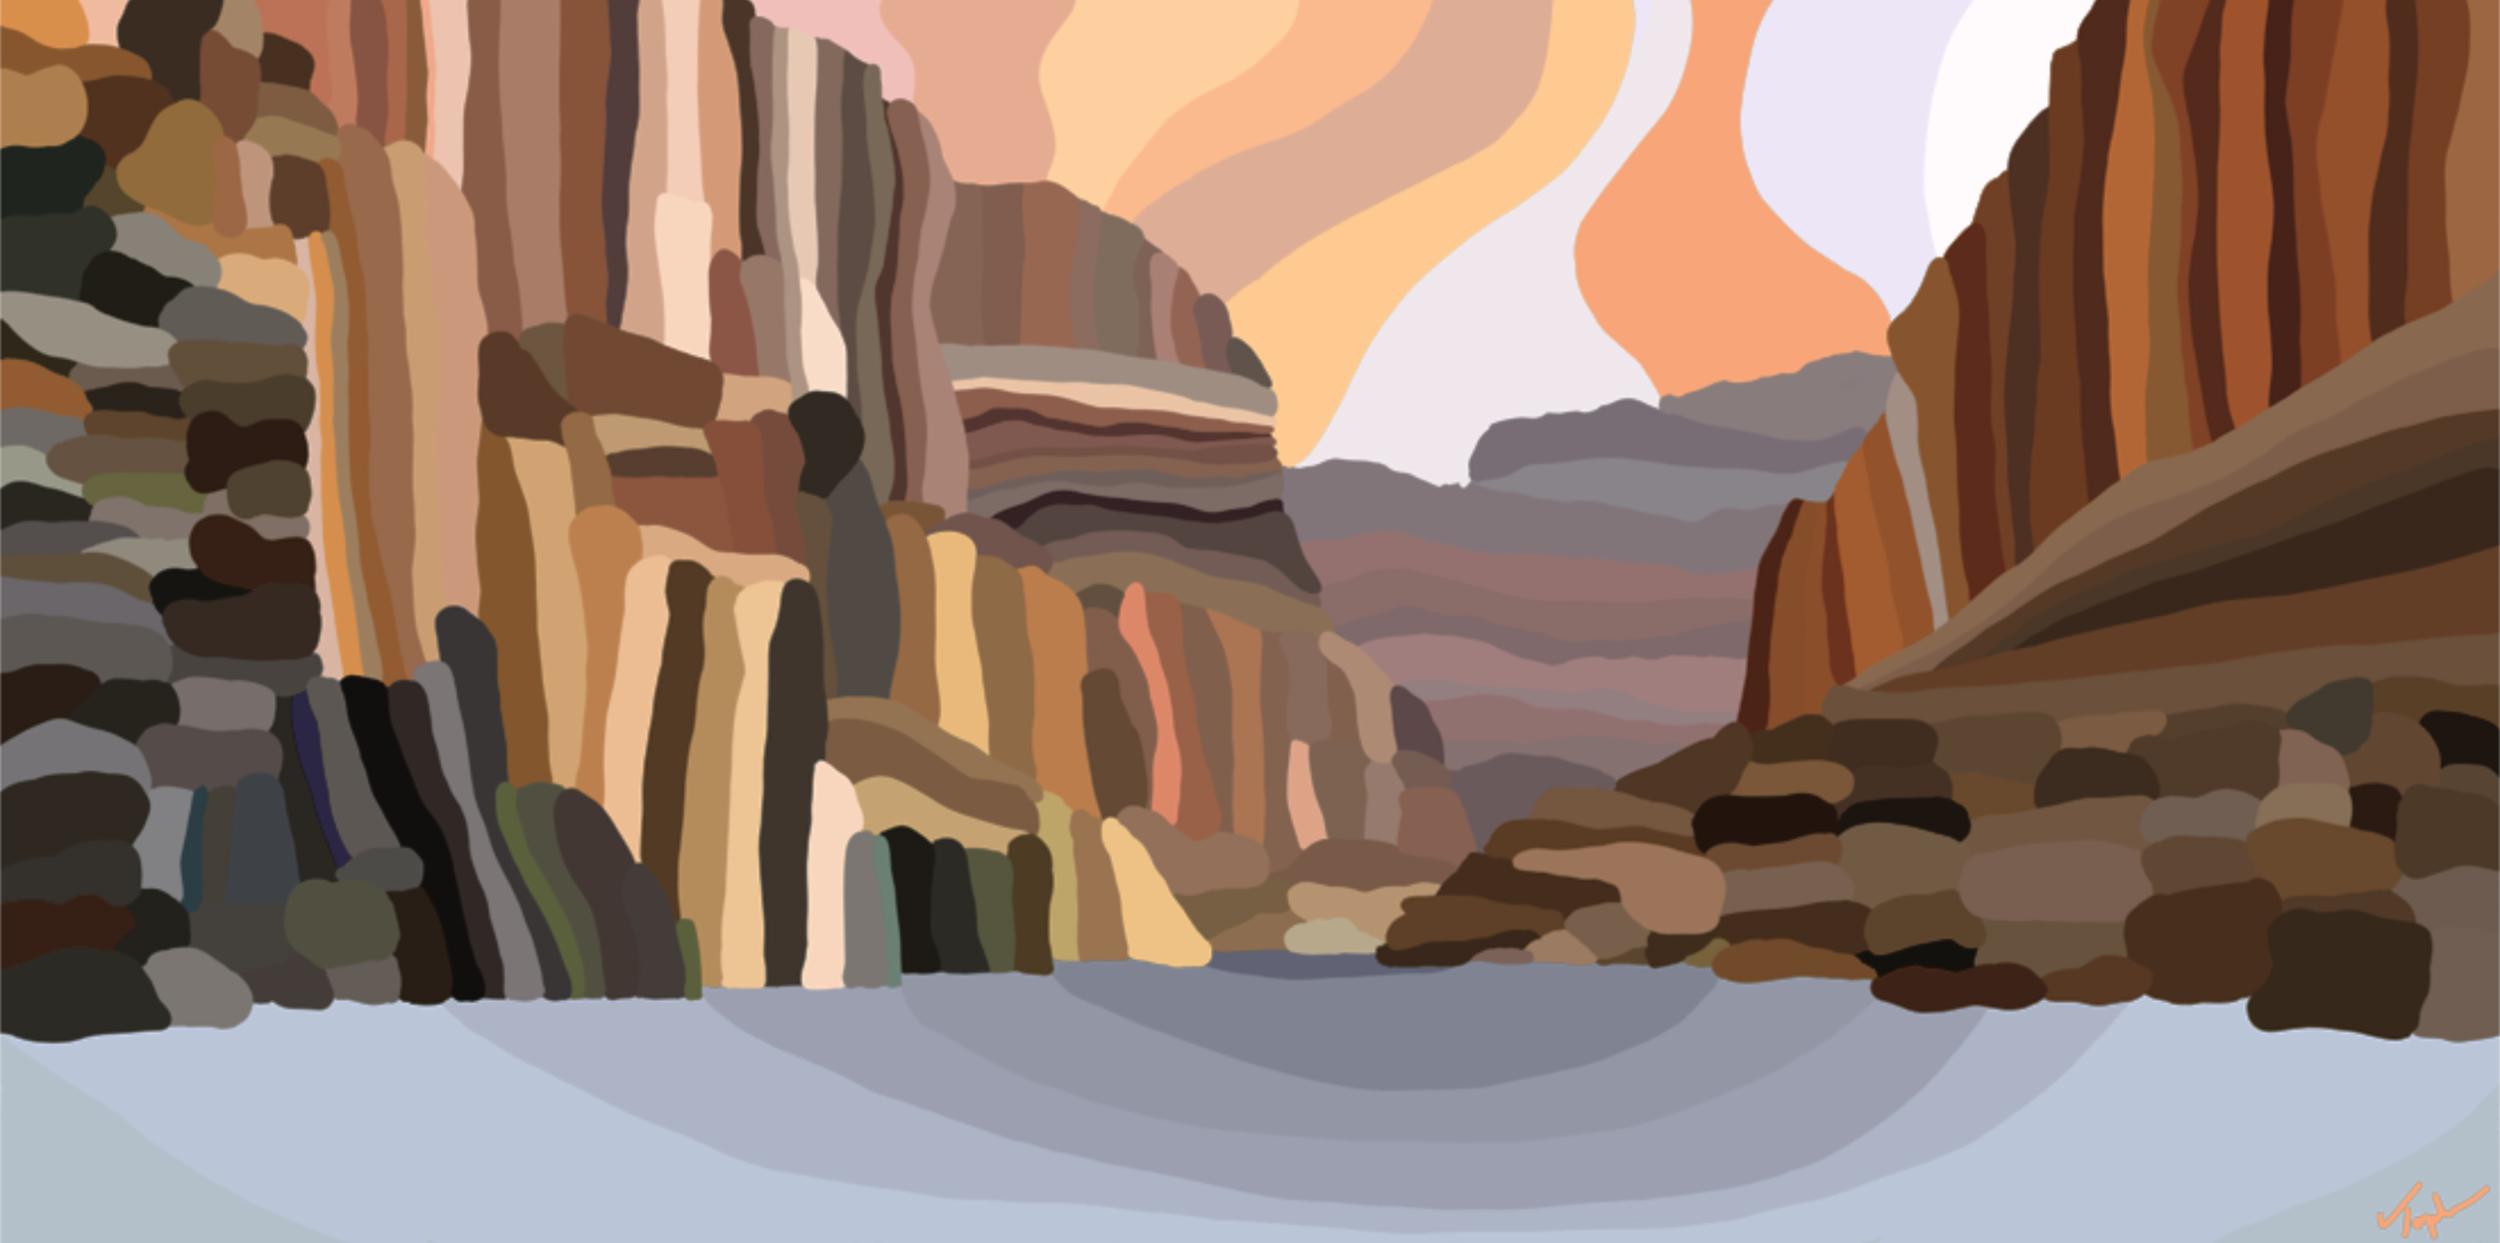 Grand Canyon National Park  , 2019  Dye Sublimation on Aluminum   ORIGINAL   |   LIMITED EDITION   |  SOUVENIR